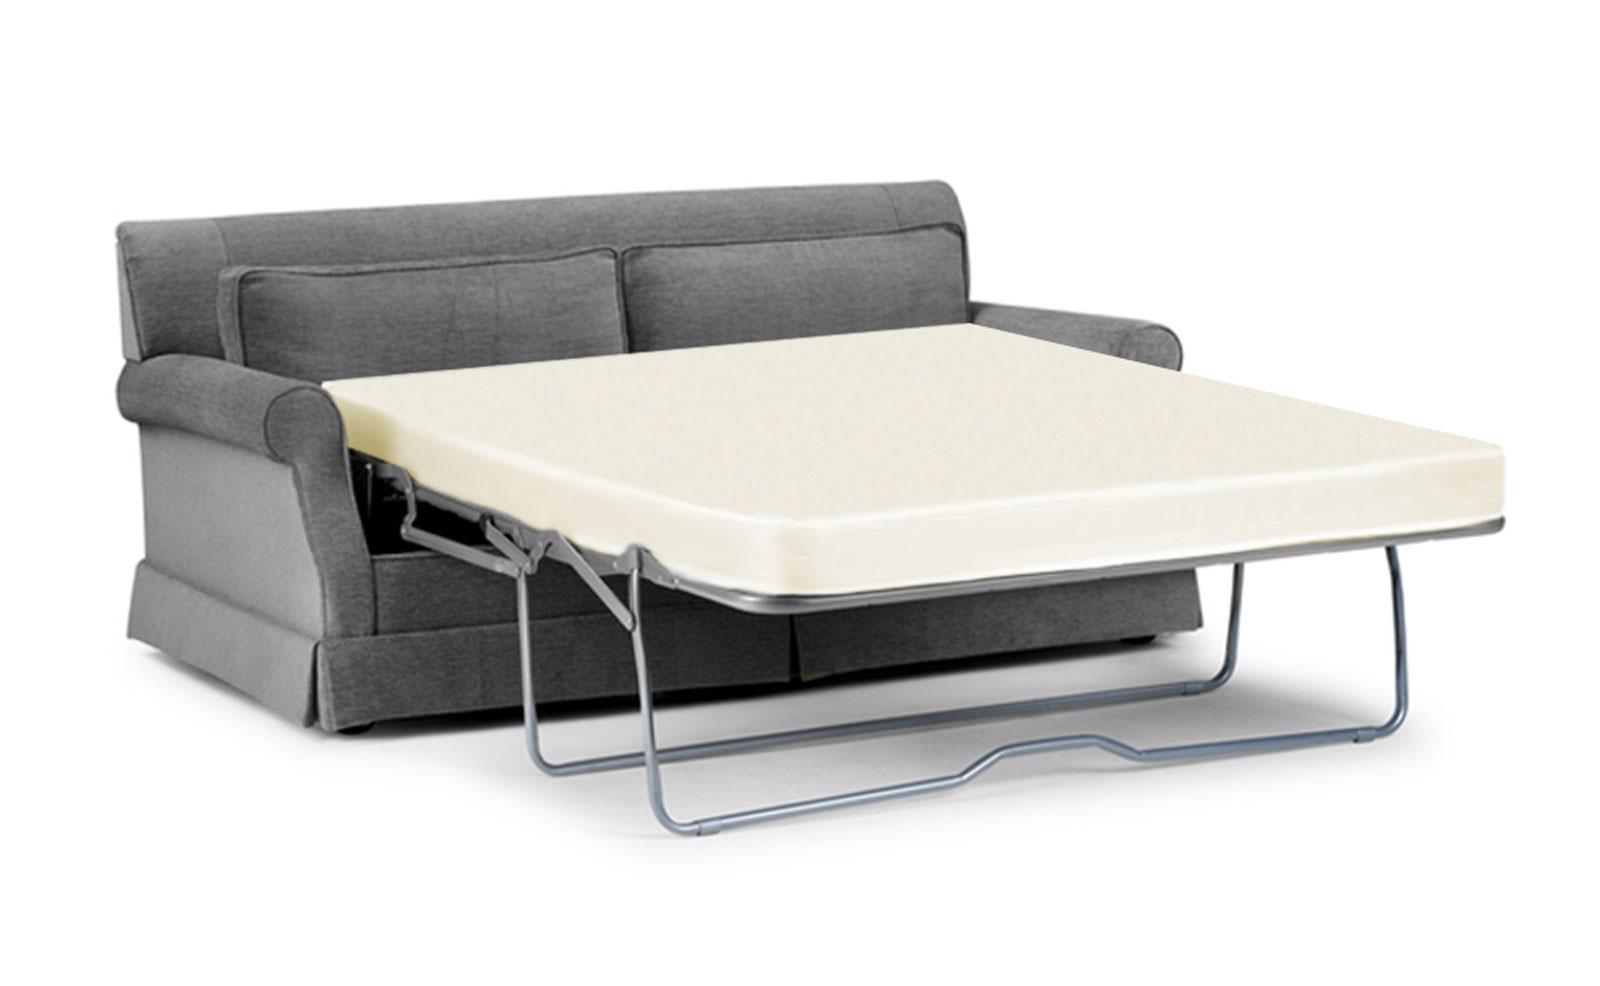 Sofa Bed Memory Foam Pertaining To Sofas Mattress (Image 14 of 20)